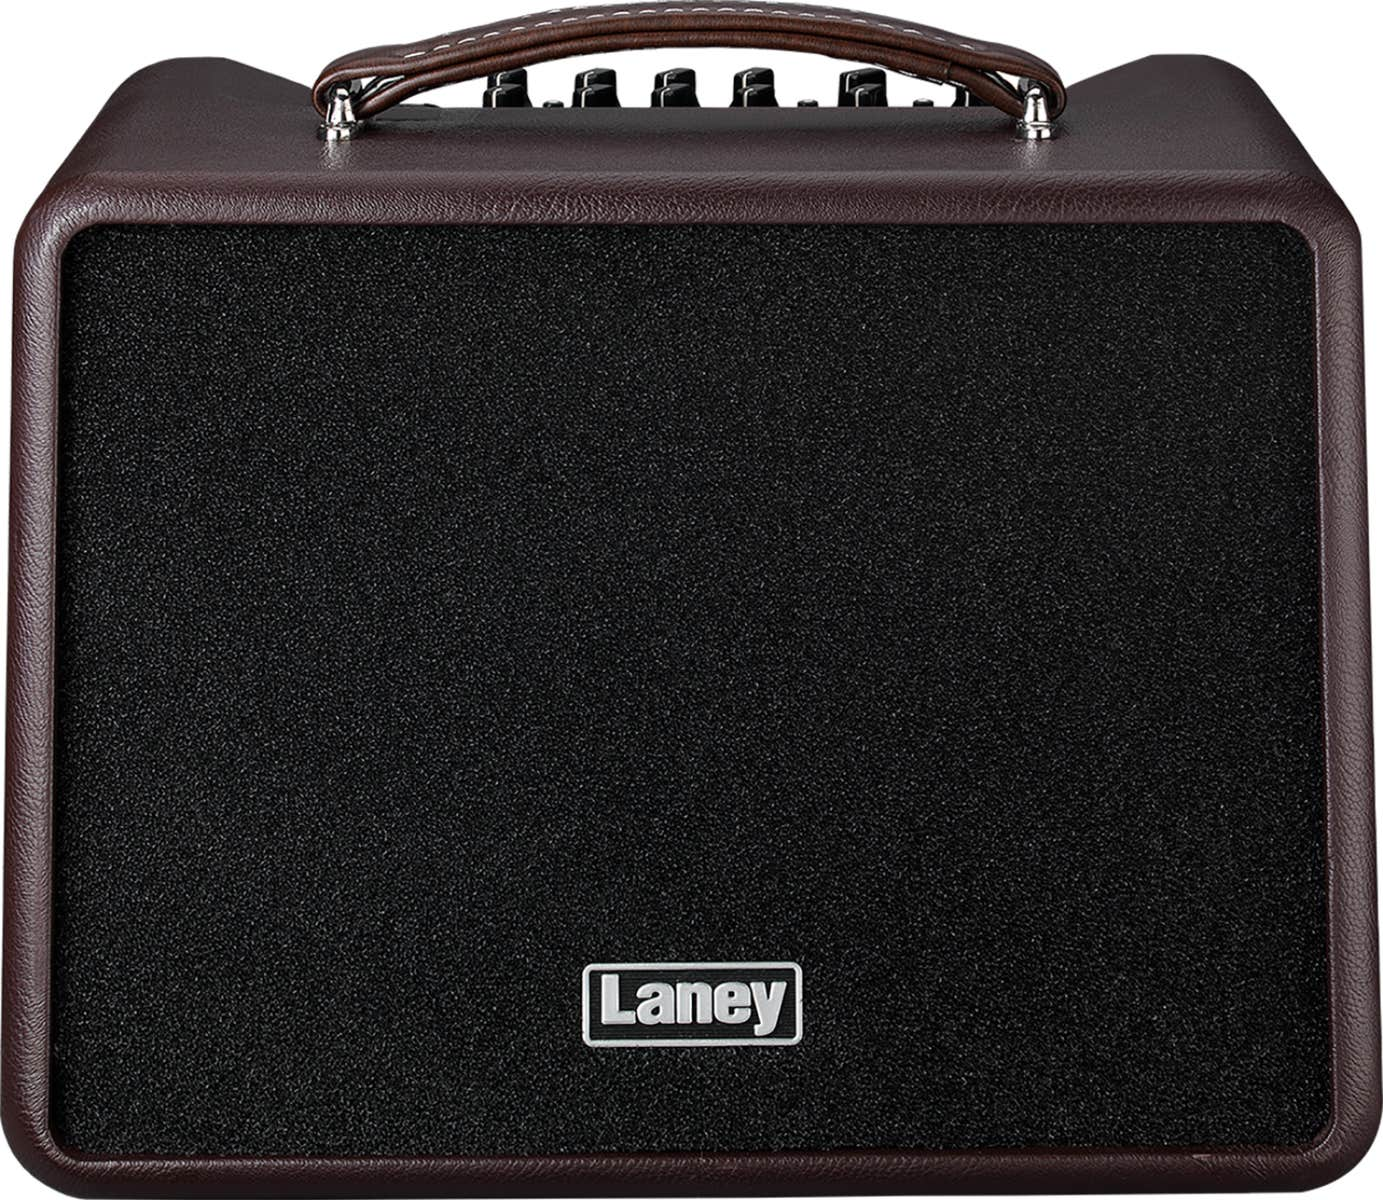 Laney A-SOLO Compact Acoustic Amplifier